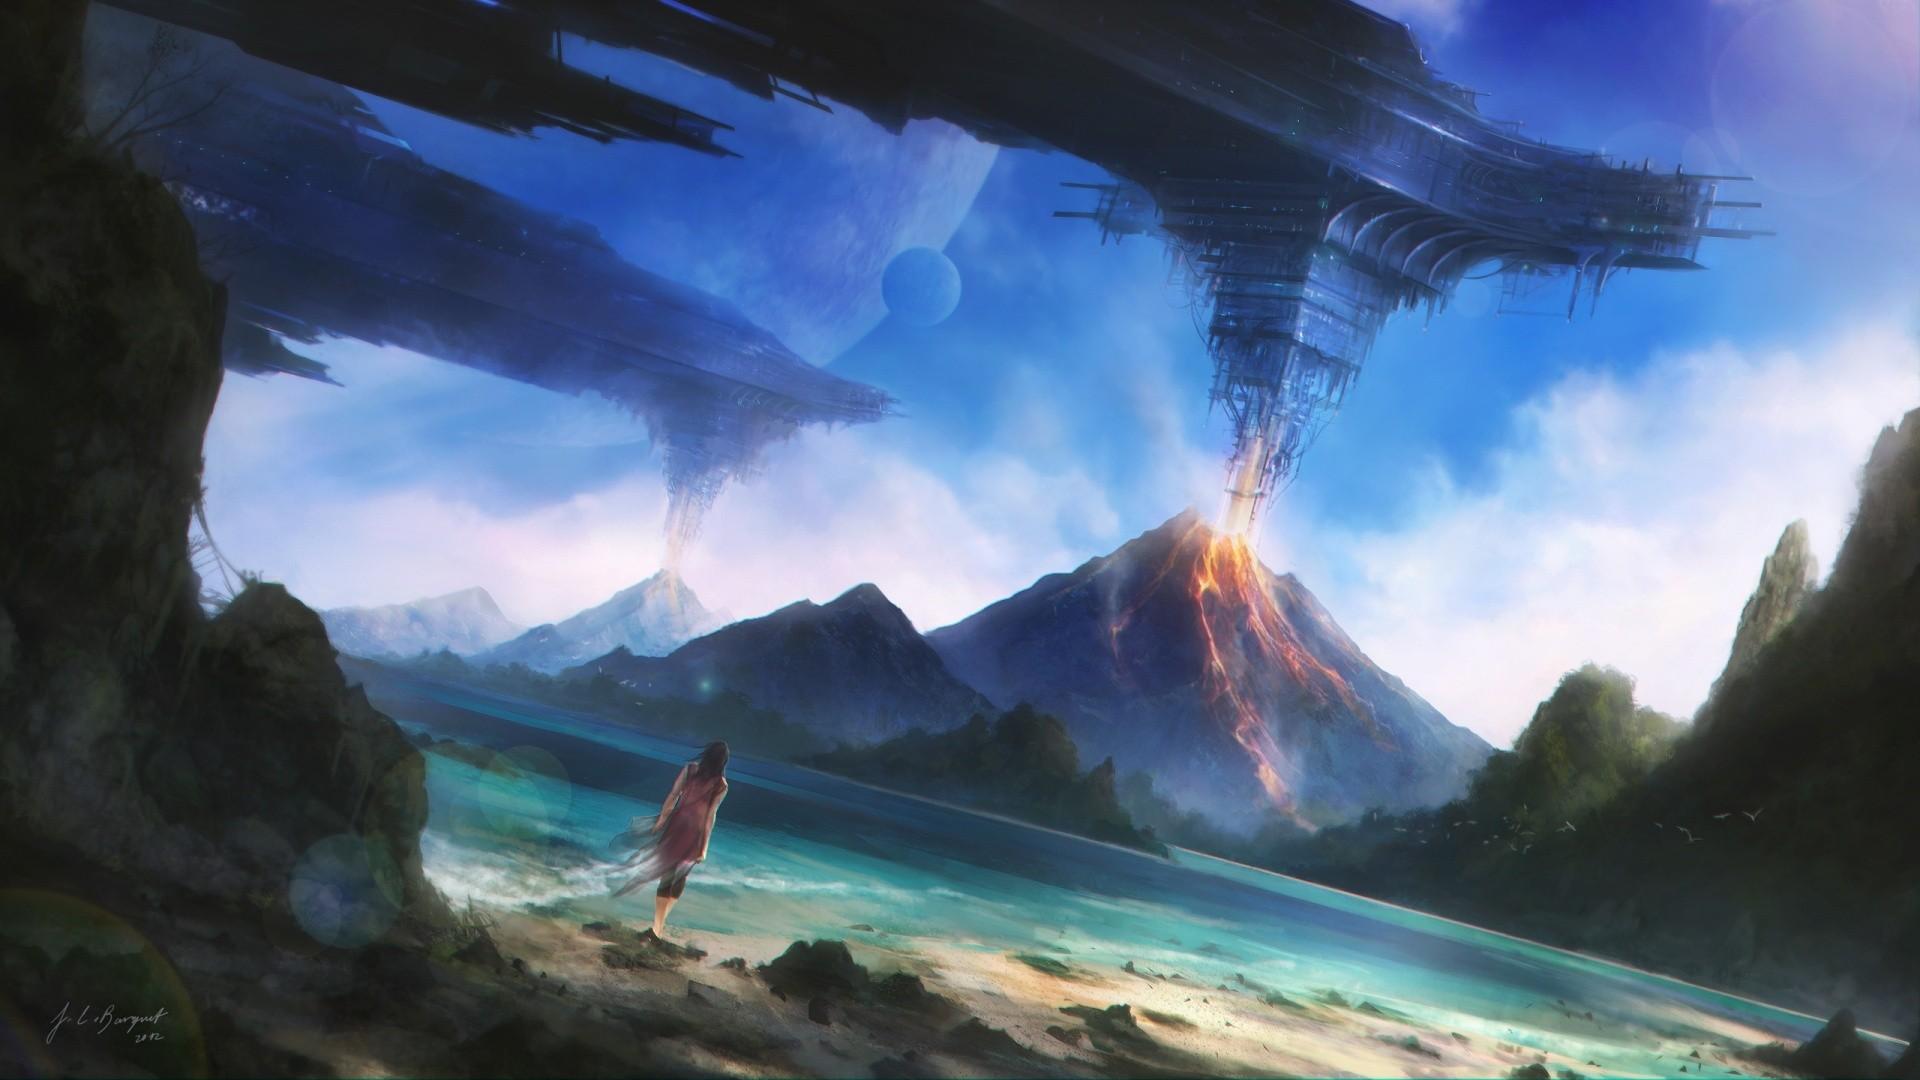 General 1920x1080 women fantasy art spaceship mountains sky planet